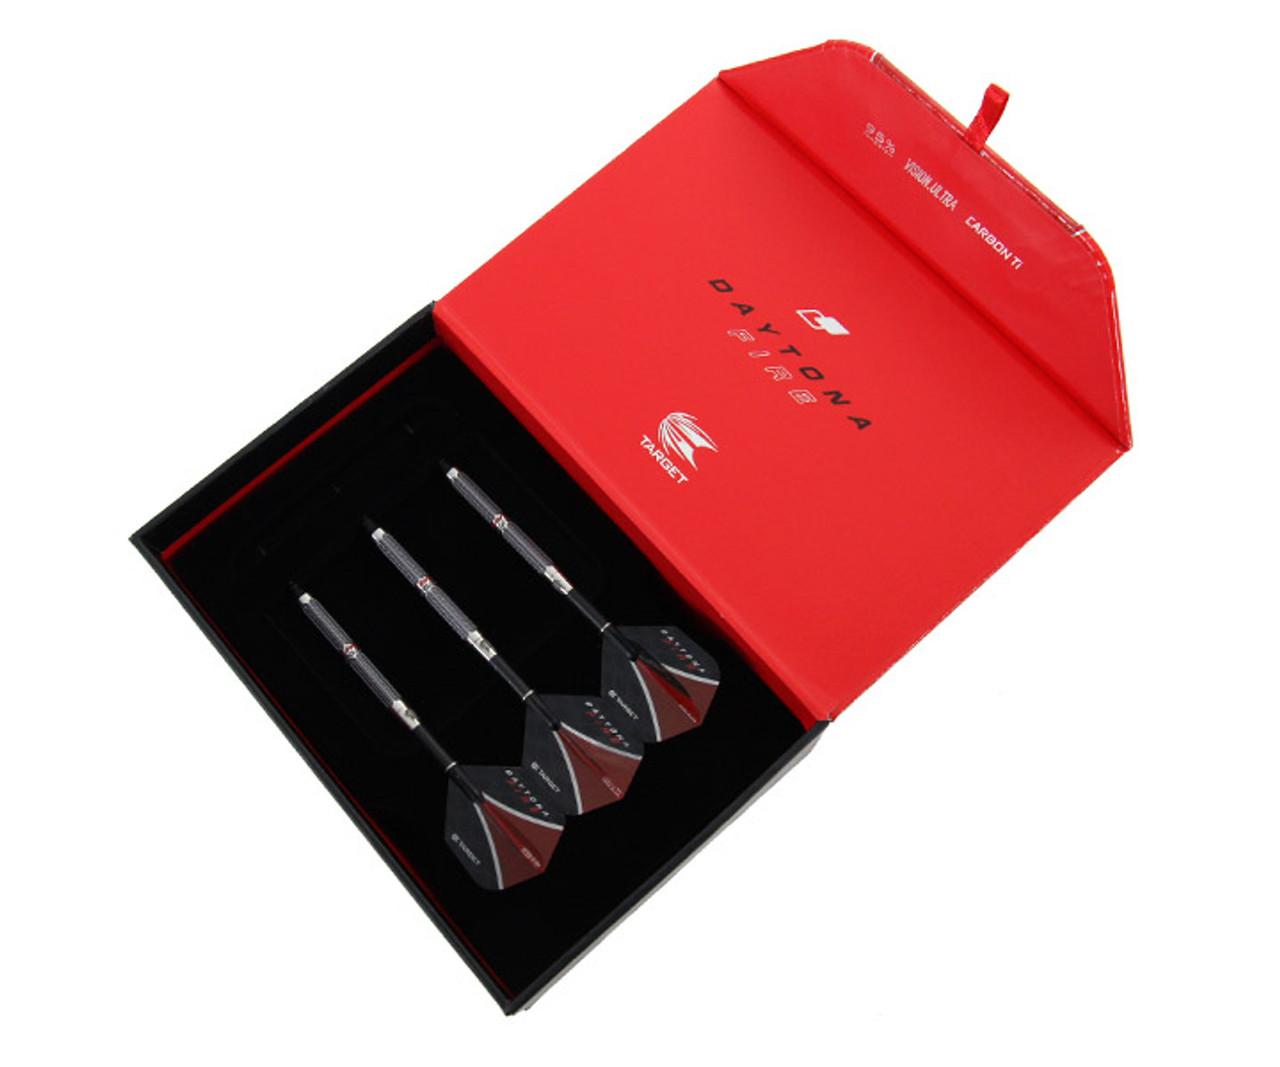 TARGET DAYTONA FIRE DF-11 18 Gram Soft Tip Darts 101875